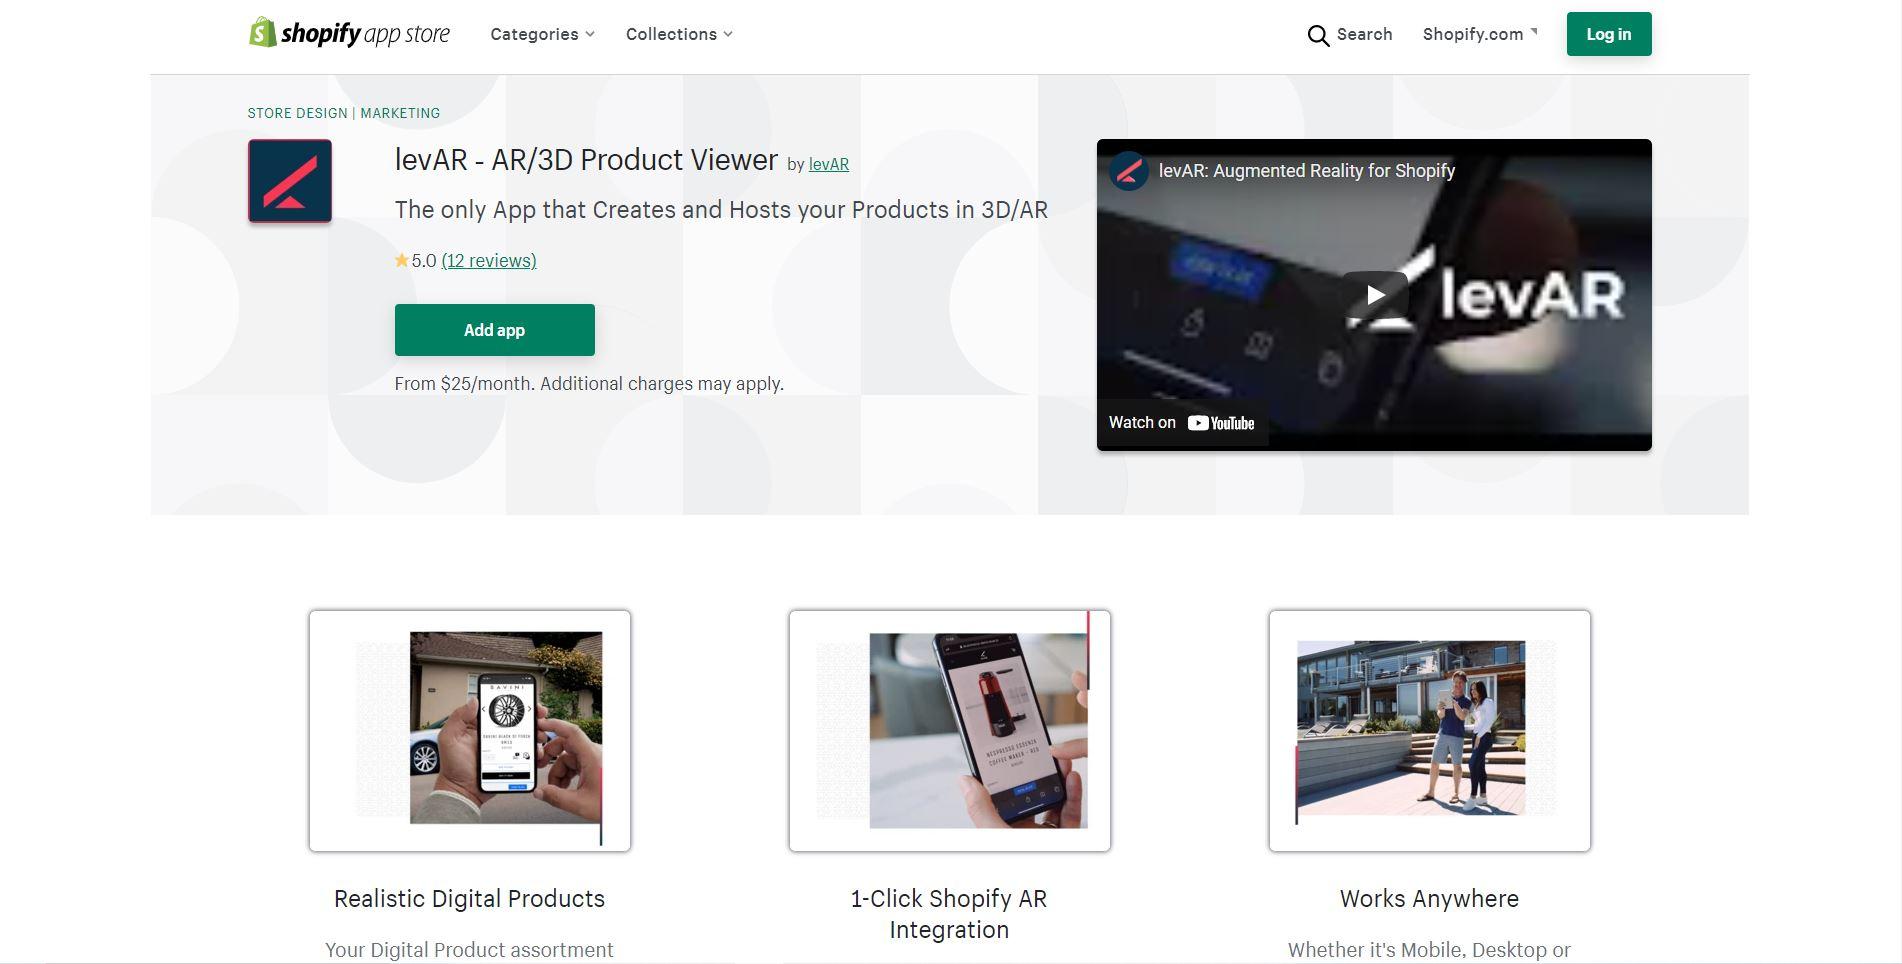 LevAR ‑ AR/3D Product Viewer